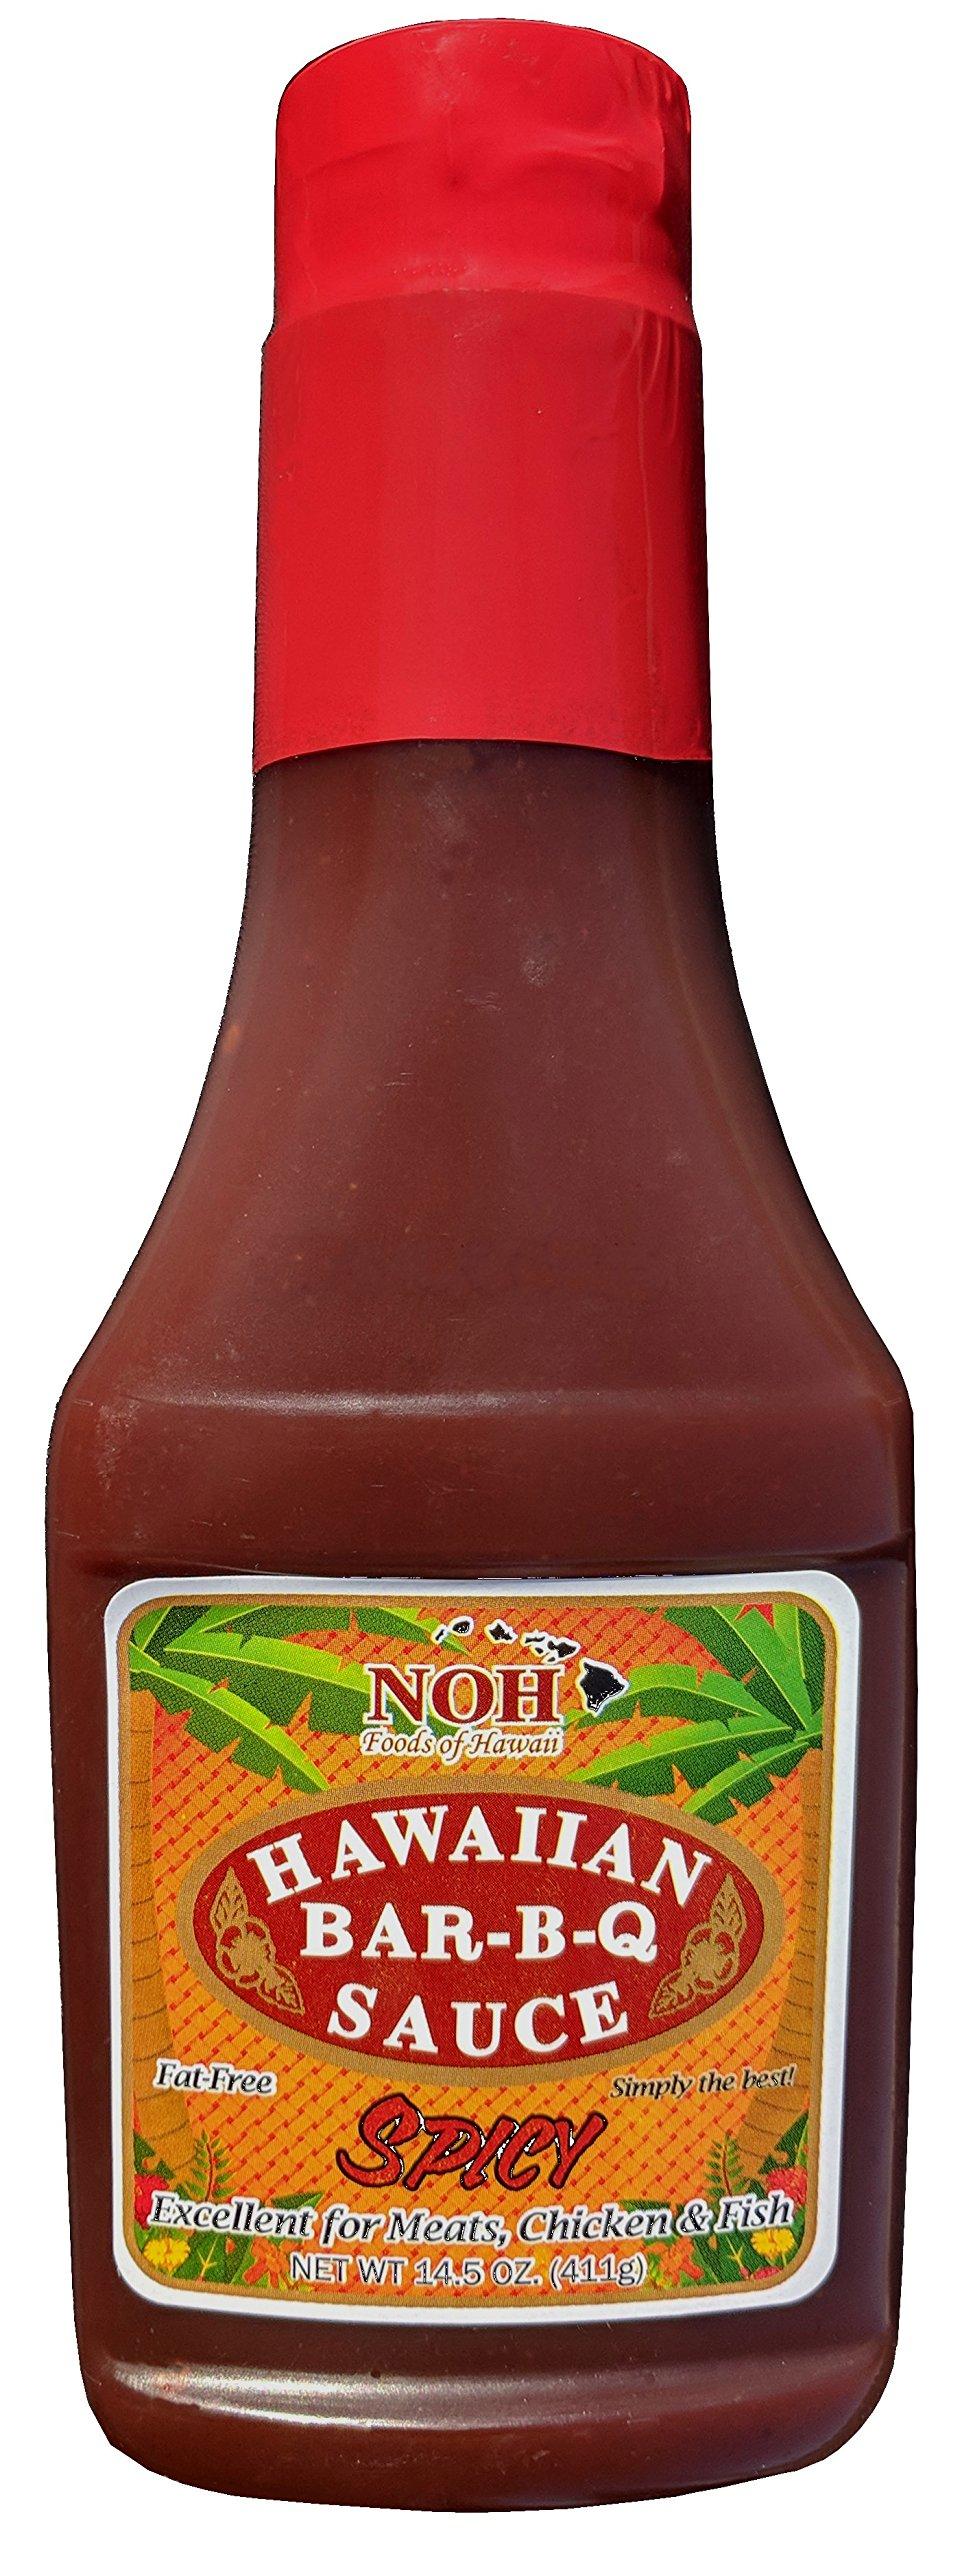 NOH Foods of Hawaii Spicy Hawaiian Bar-B-Q Sauce, 14.5 Ounce (Pack of 6)